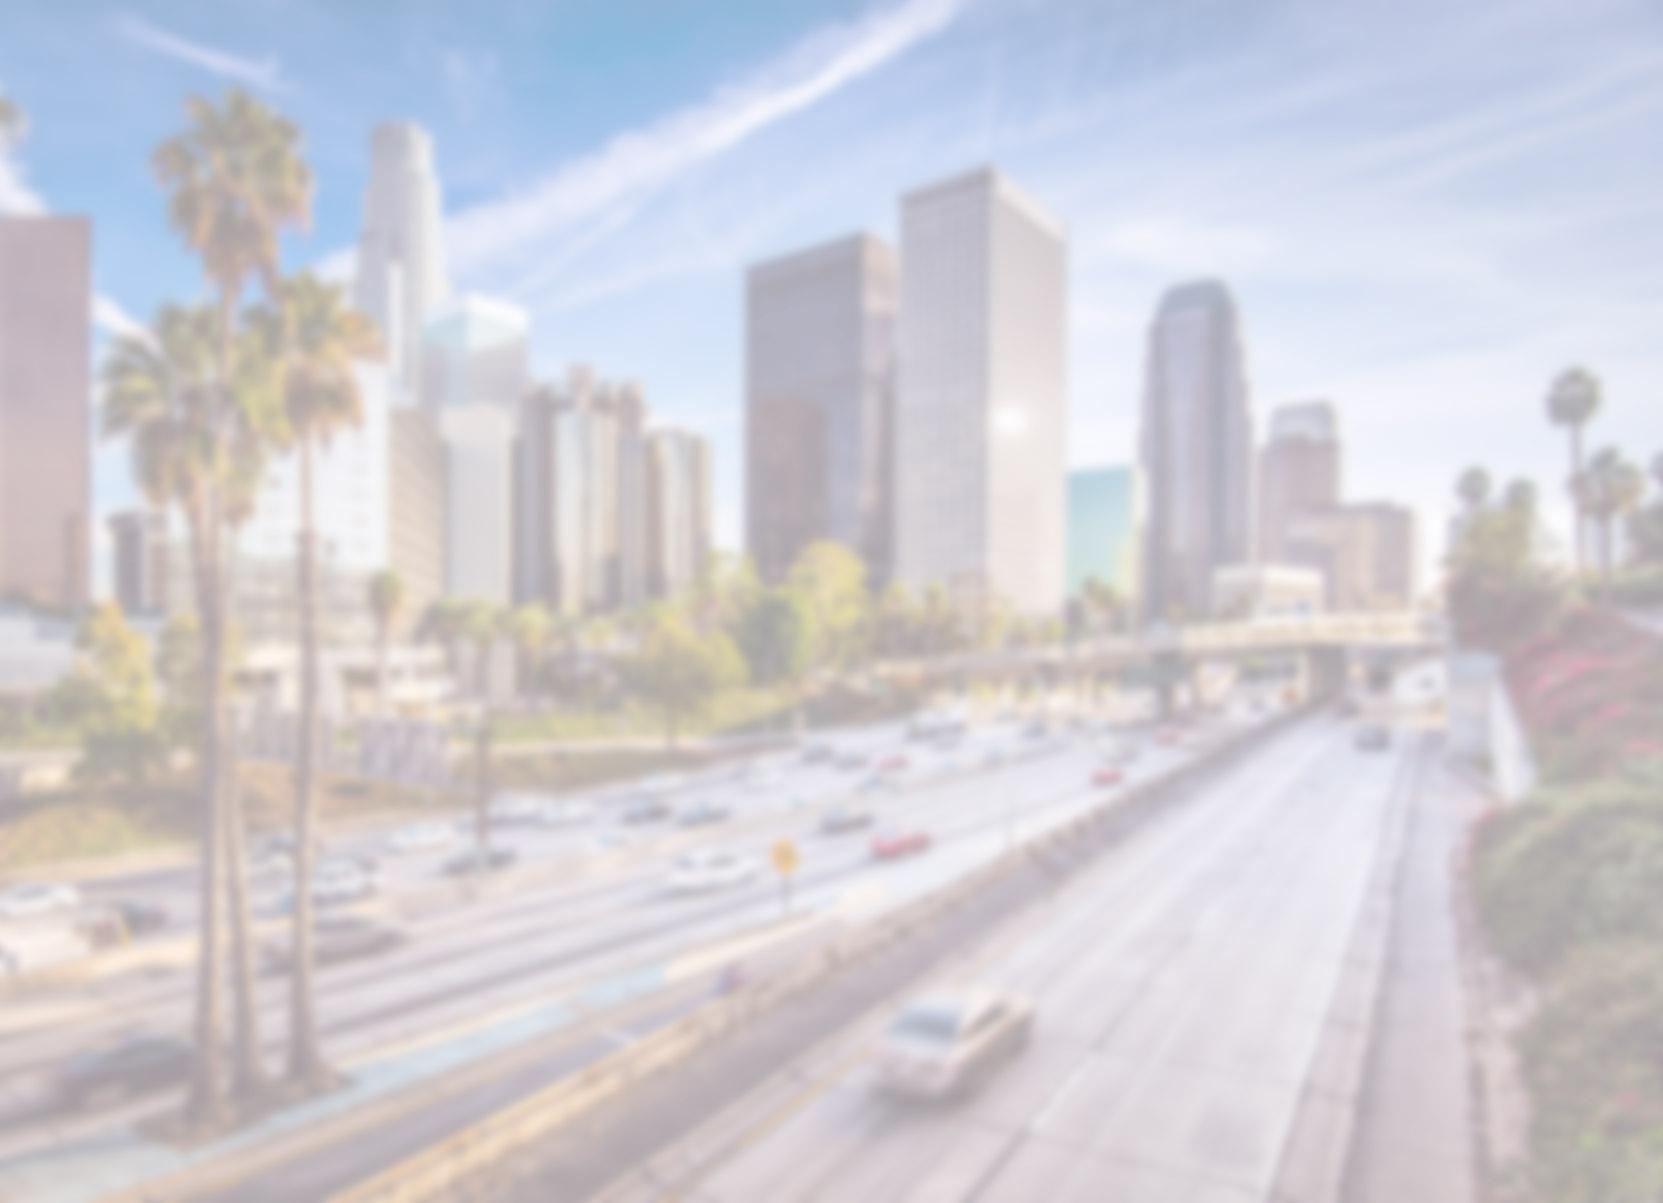 ITSupport_LA_DigiSYNCTechnologySolutions_light